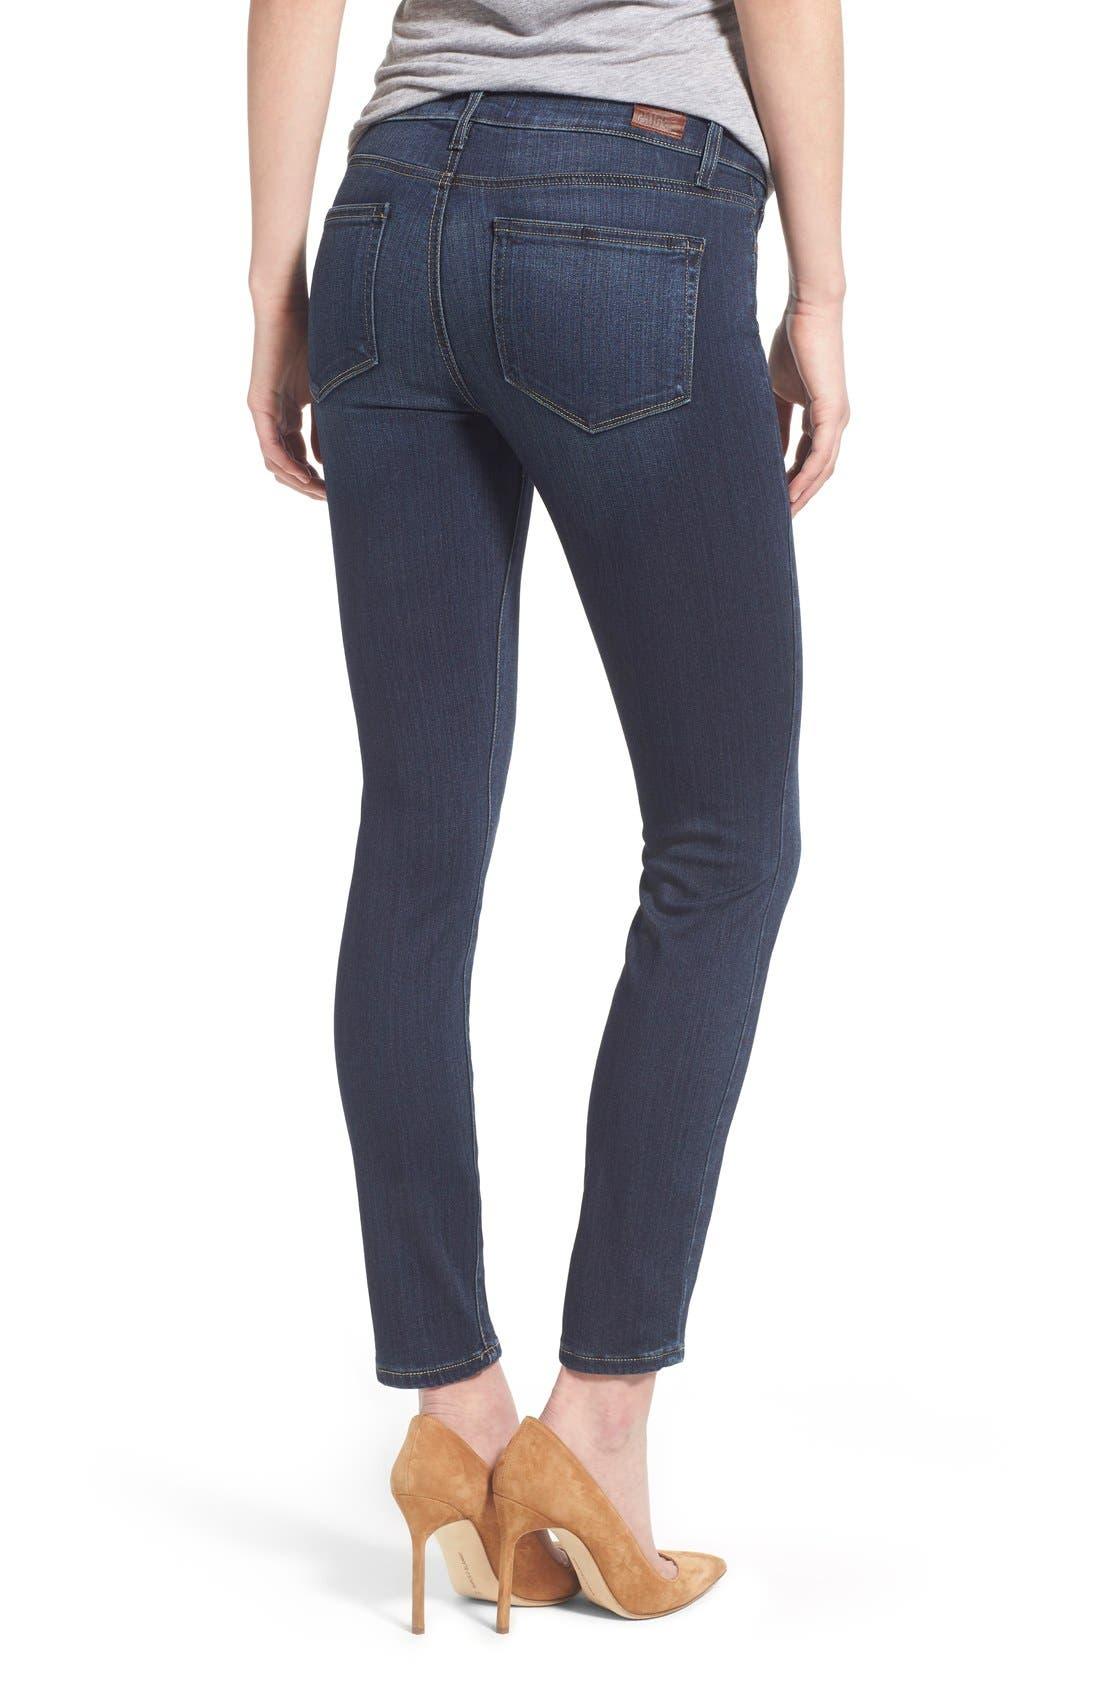 Alternate Image 2  - Paige Denim 'Transcend - Verdugo' Ankle Ultra Skinny Jeans (Nottingham) (Petite)